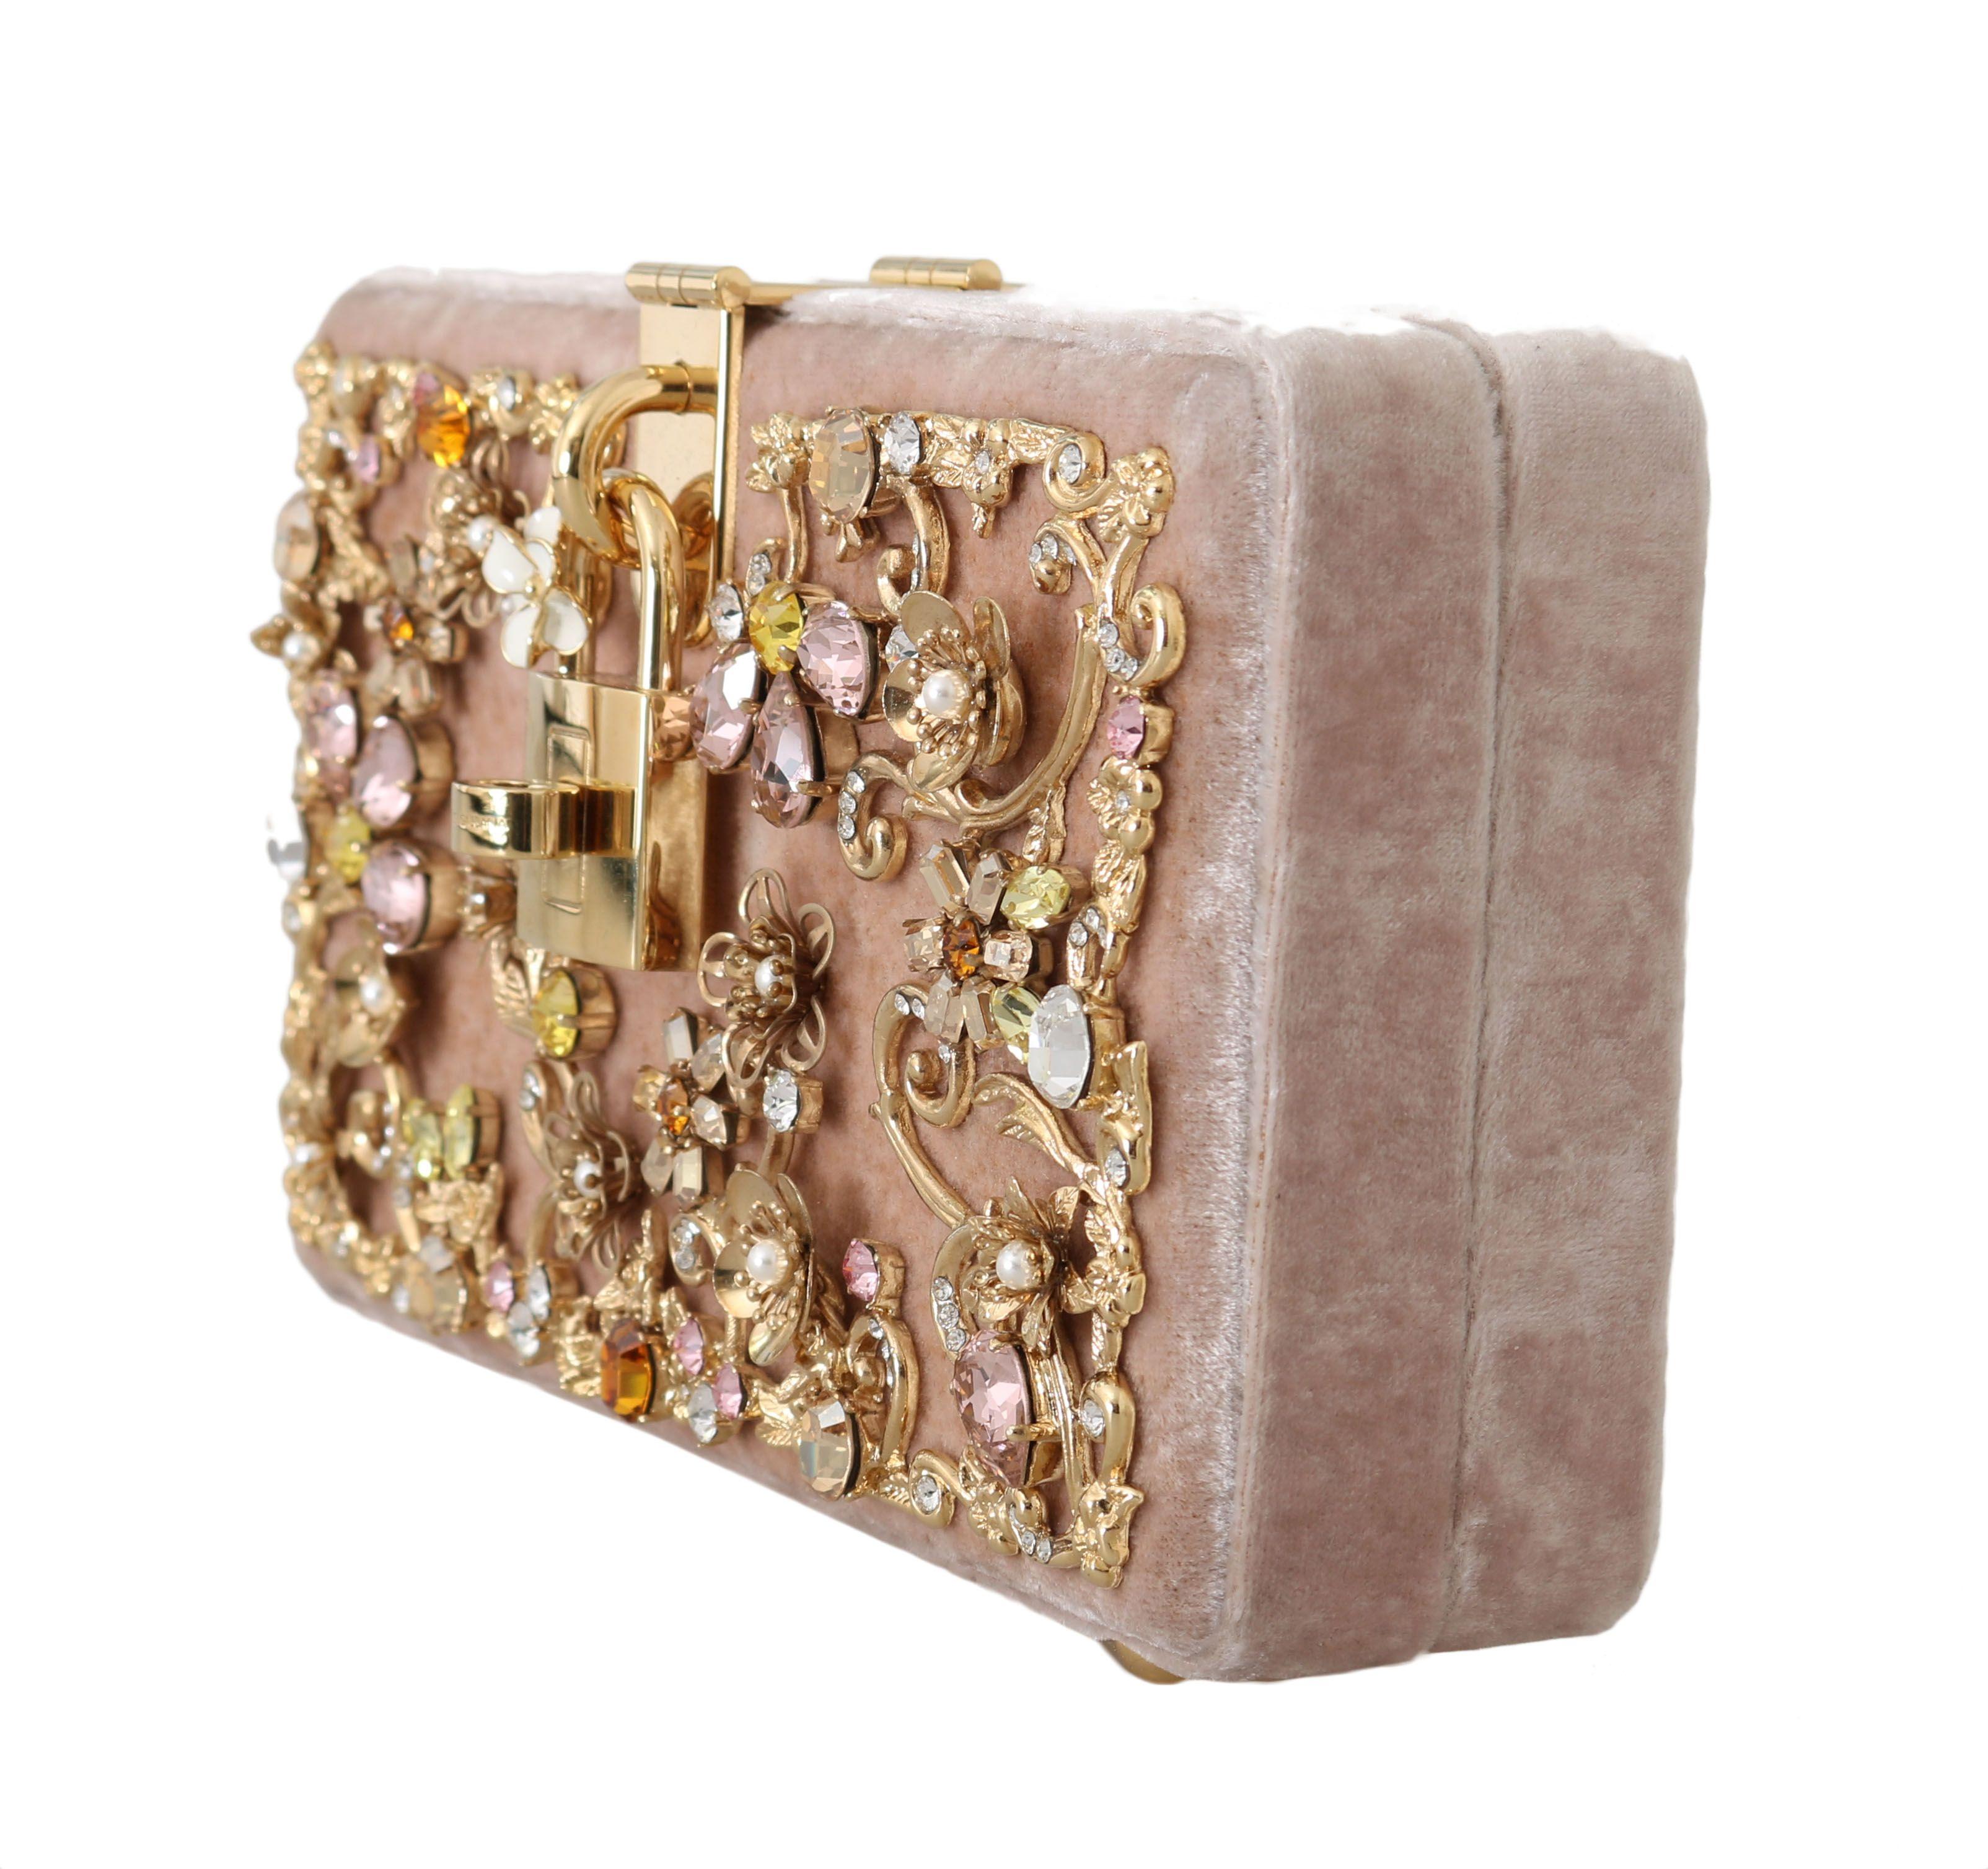 Dolce & Gabbana Pink Velvet Gold Baroque Crystal Clutch Purse